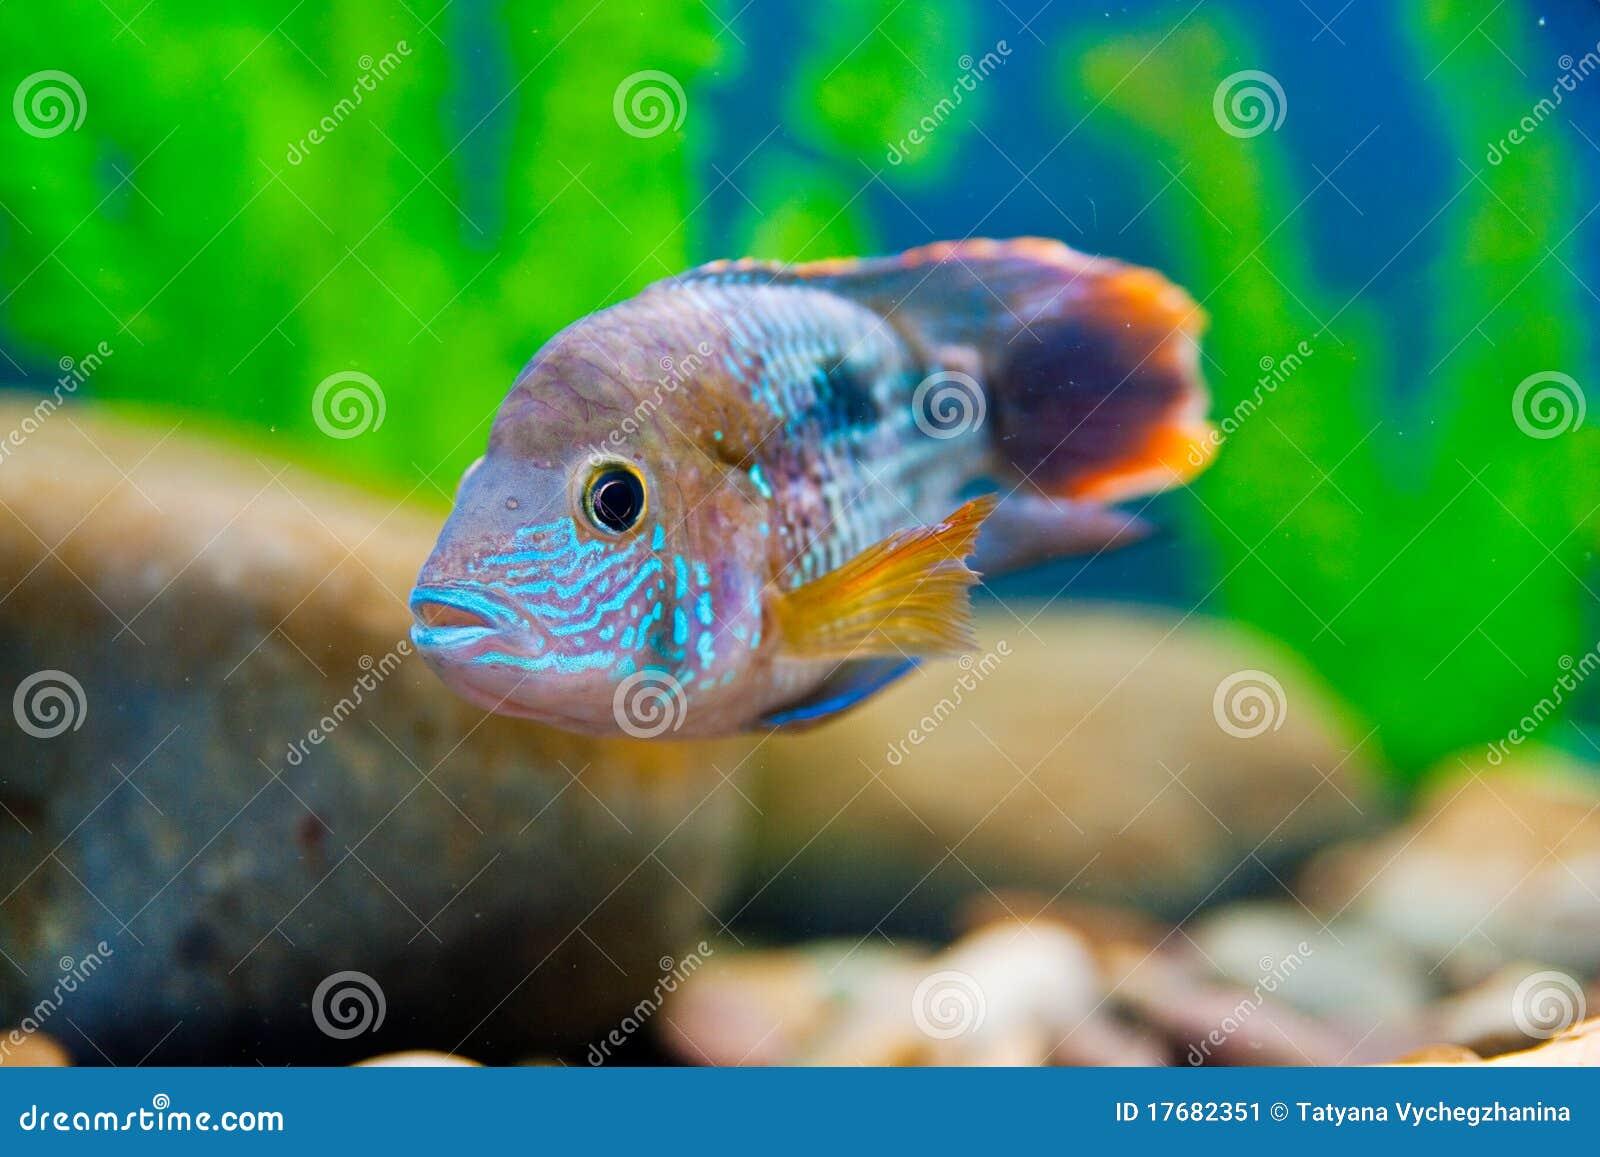 Colorful Fish Aquarium Stock Image Image Of Diving